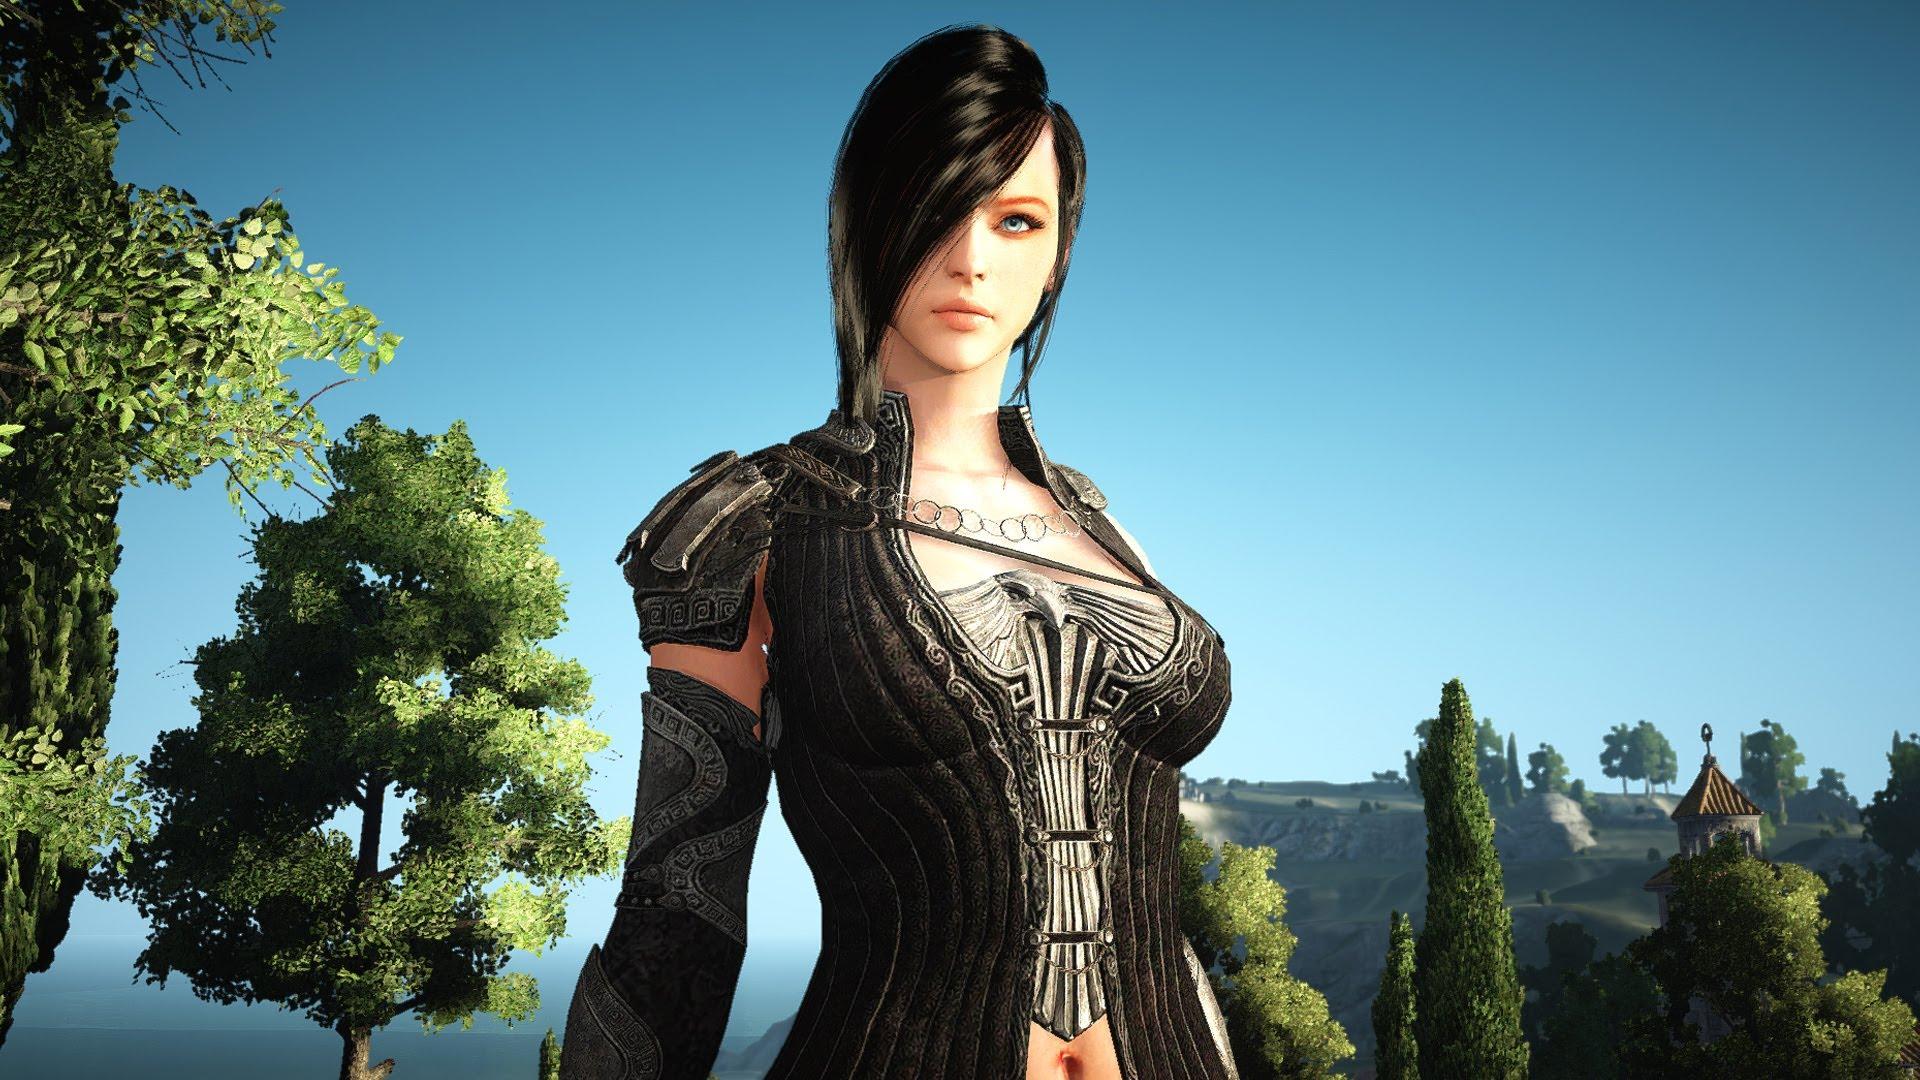 Black Desert Online primeşte deja primul expansion